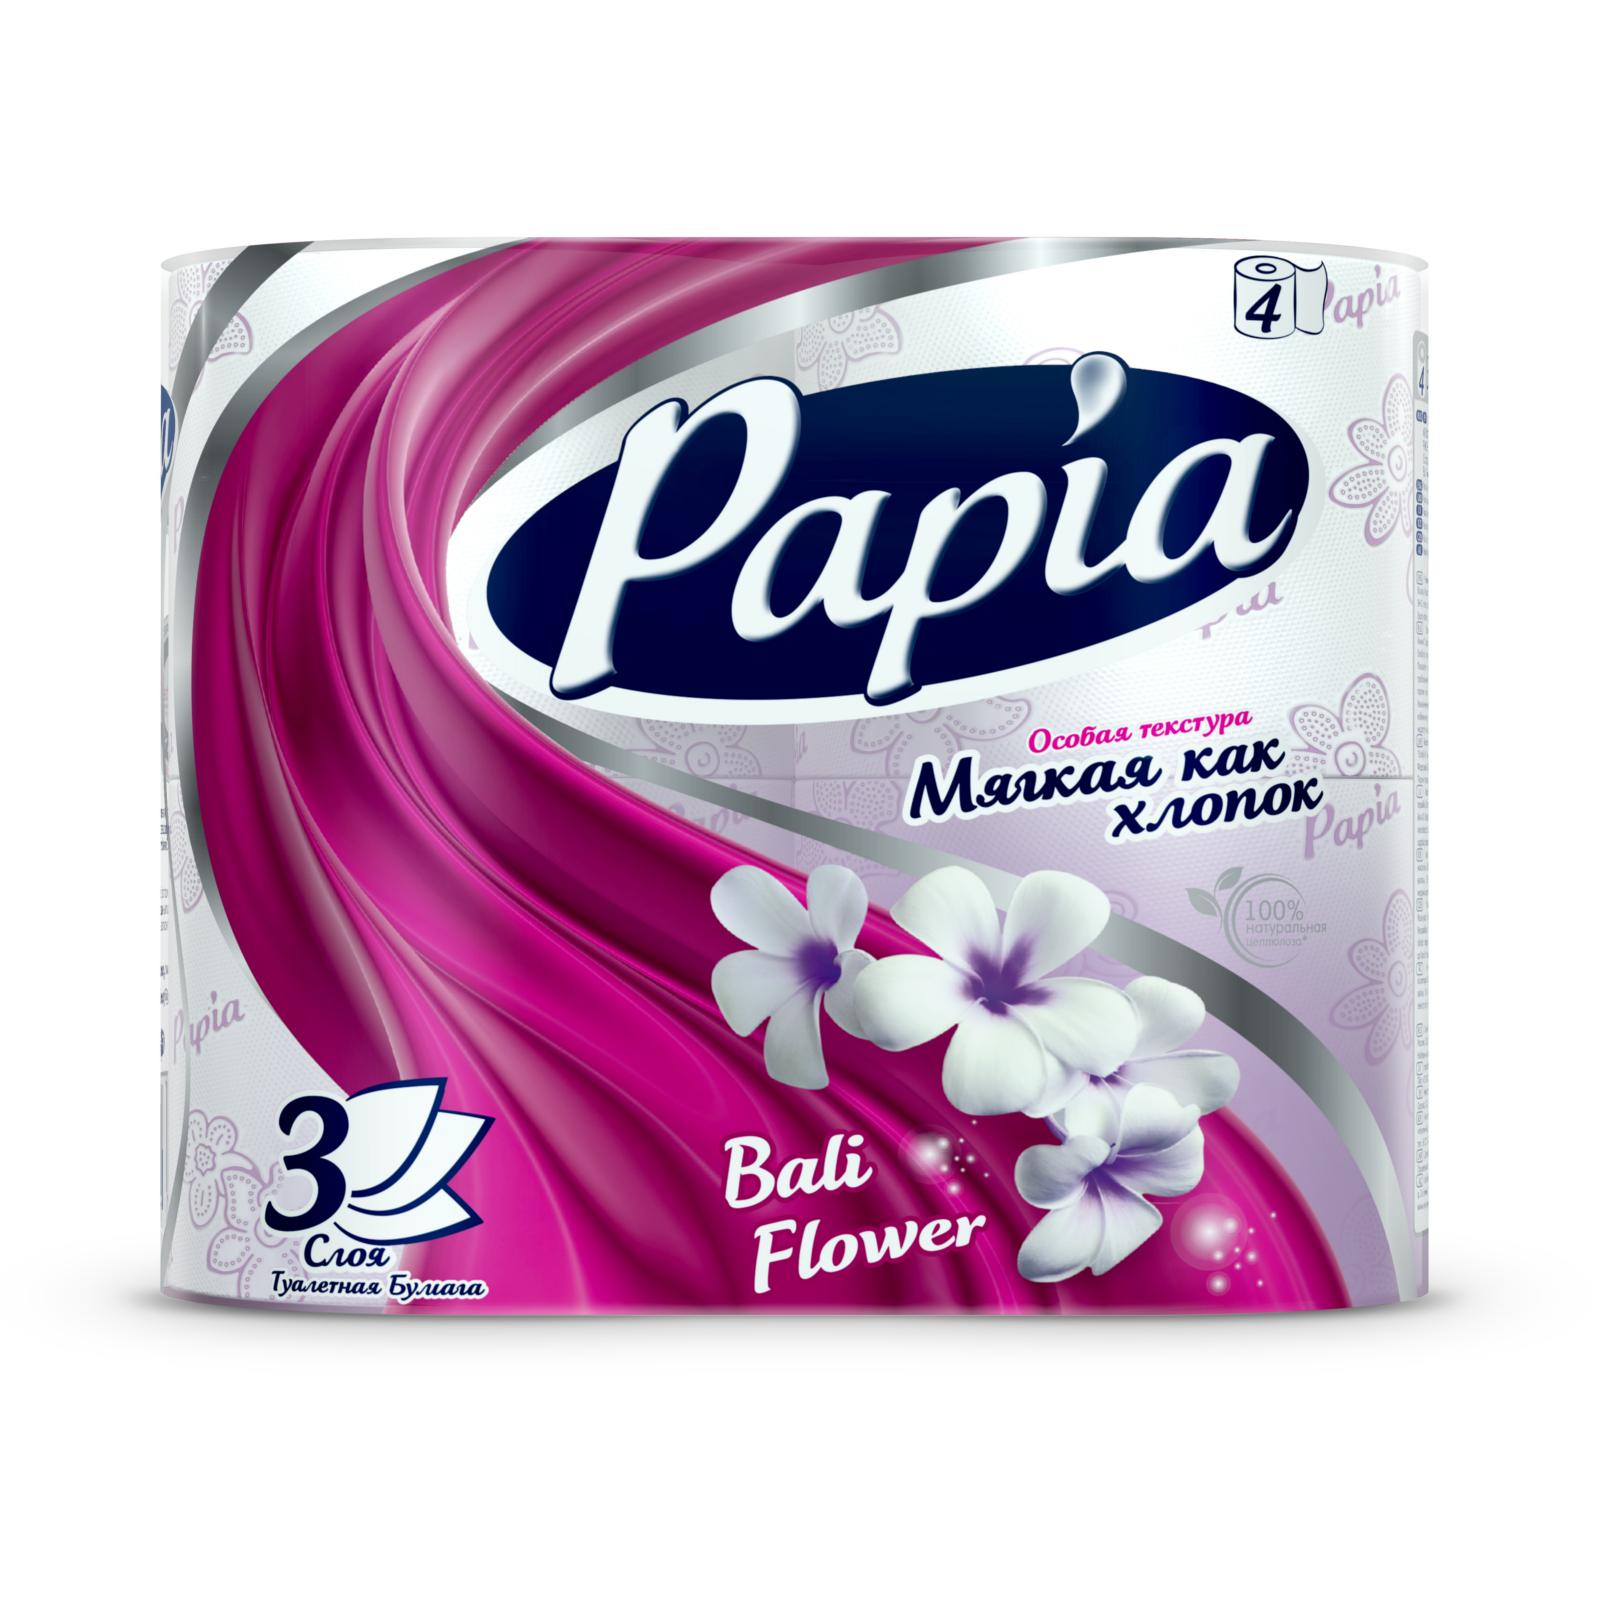 Туалетная бумага Papia с рисунком балийский цветок (3 слоя) 8 шт<br>